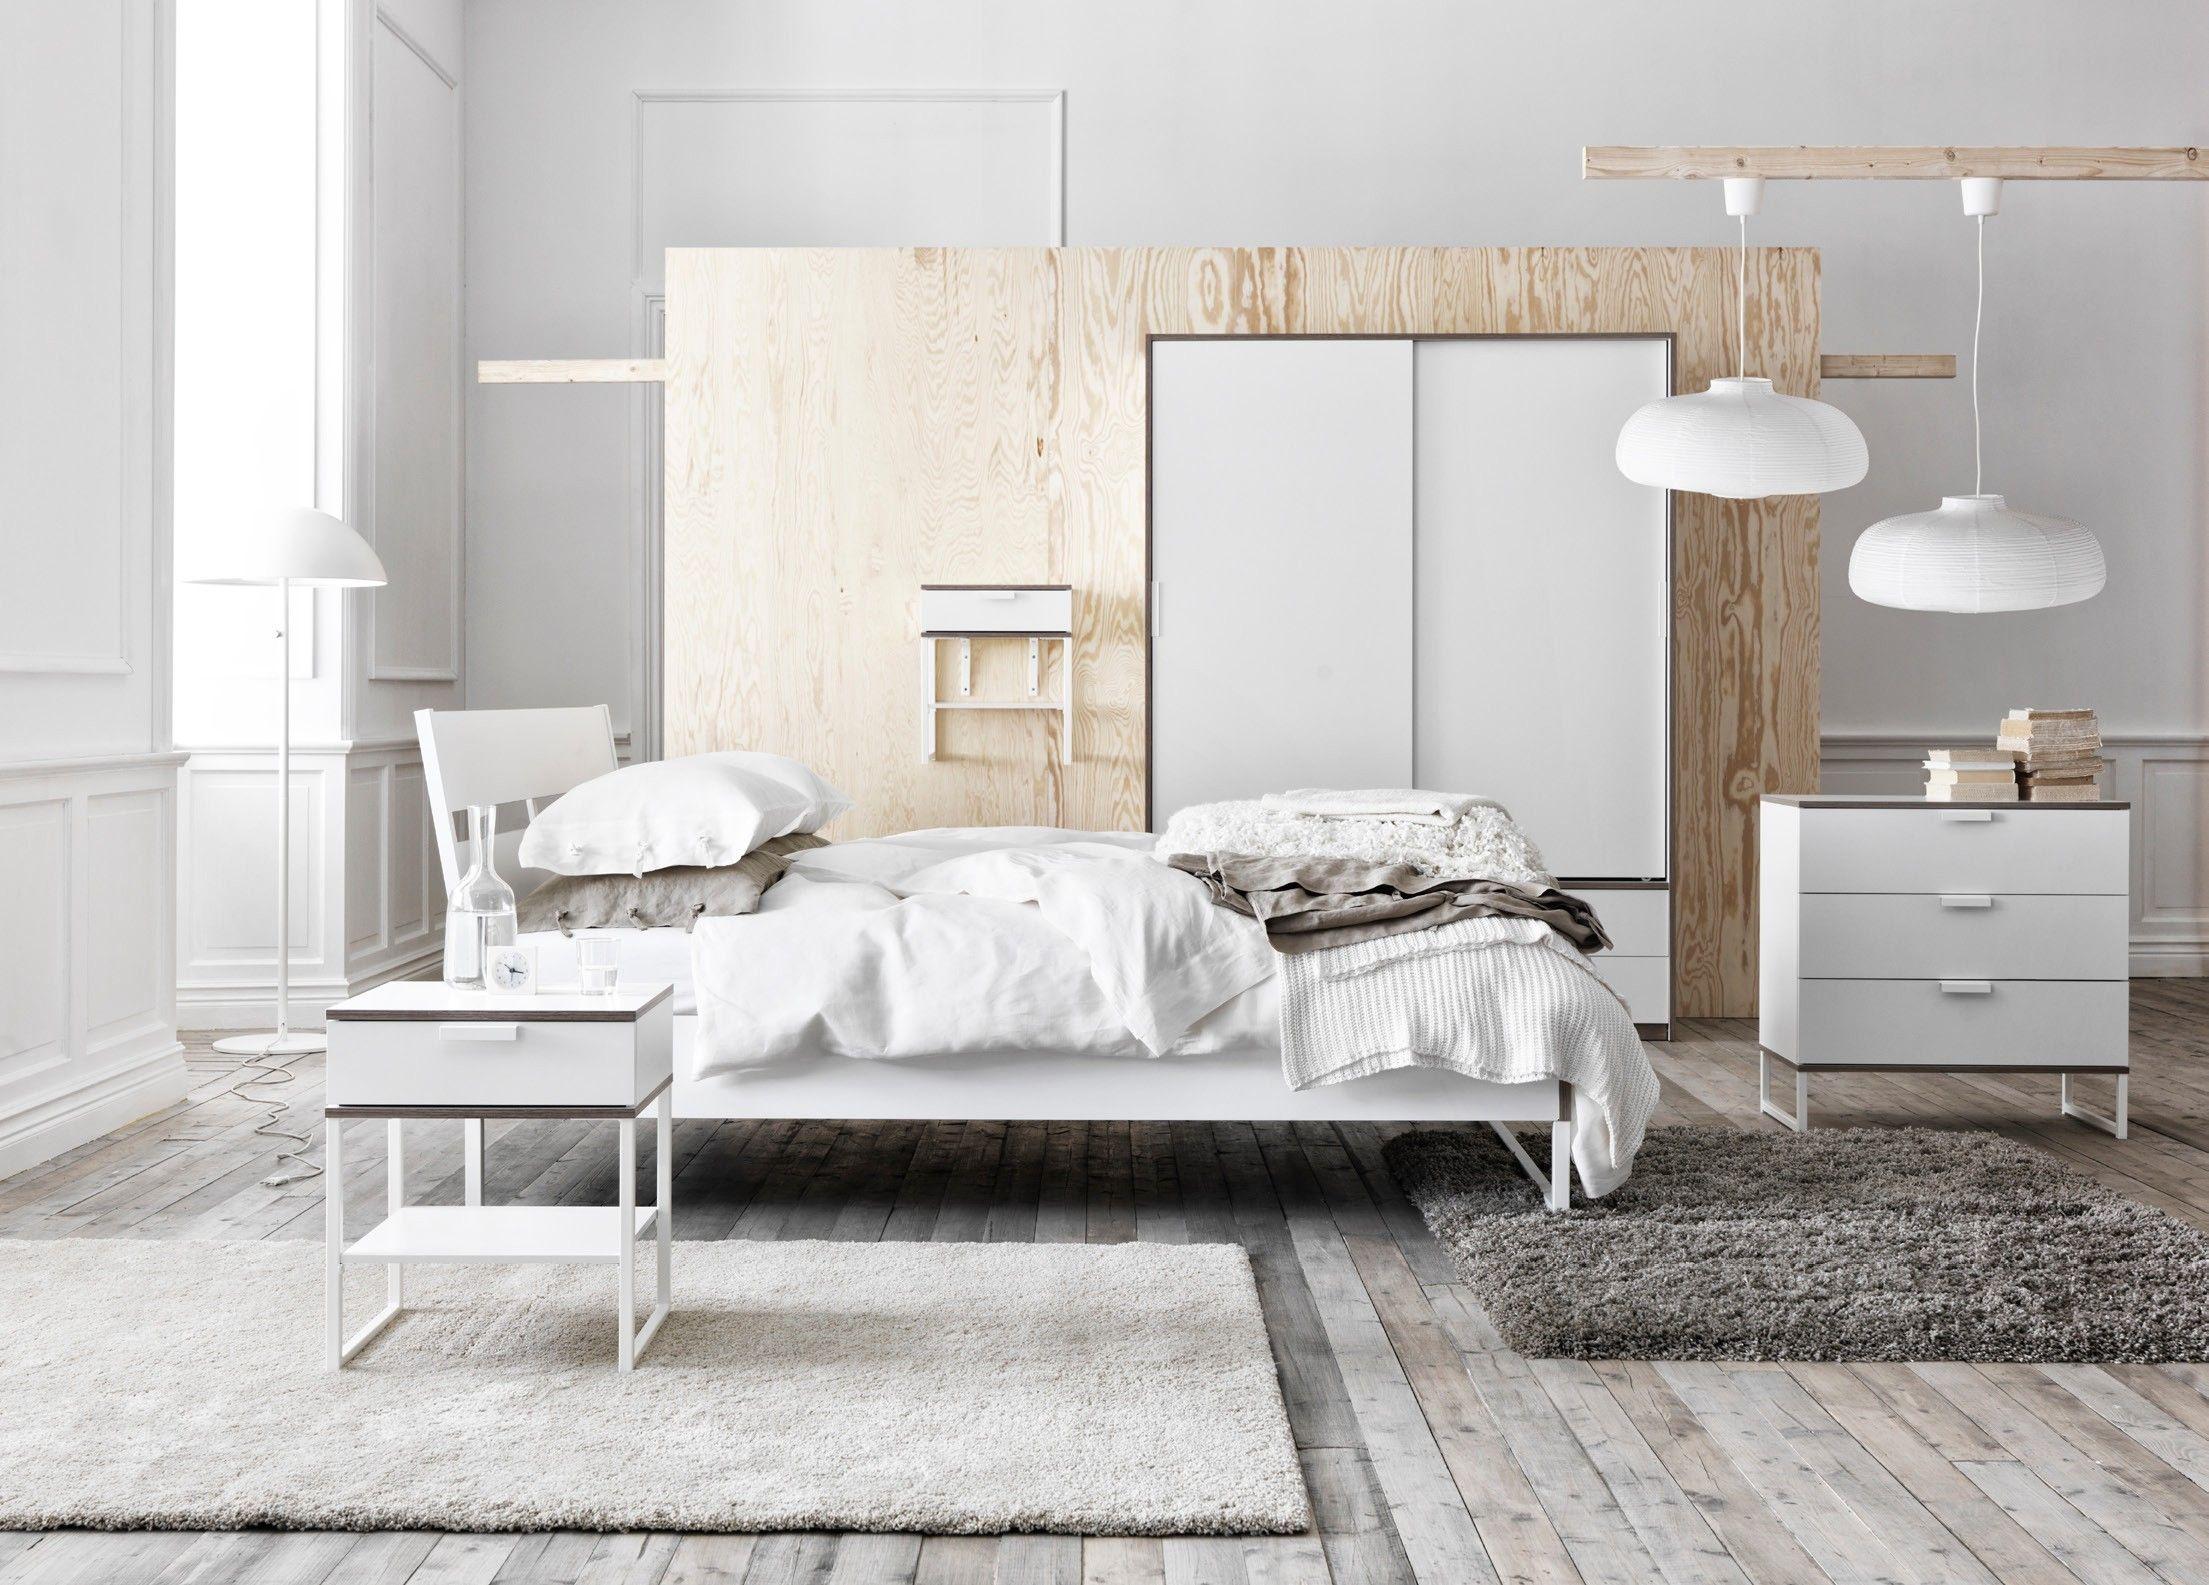 Ikea Trysil Bedroom Trends Bedroom Interior Inside Home